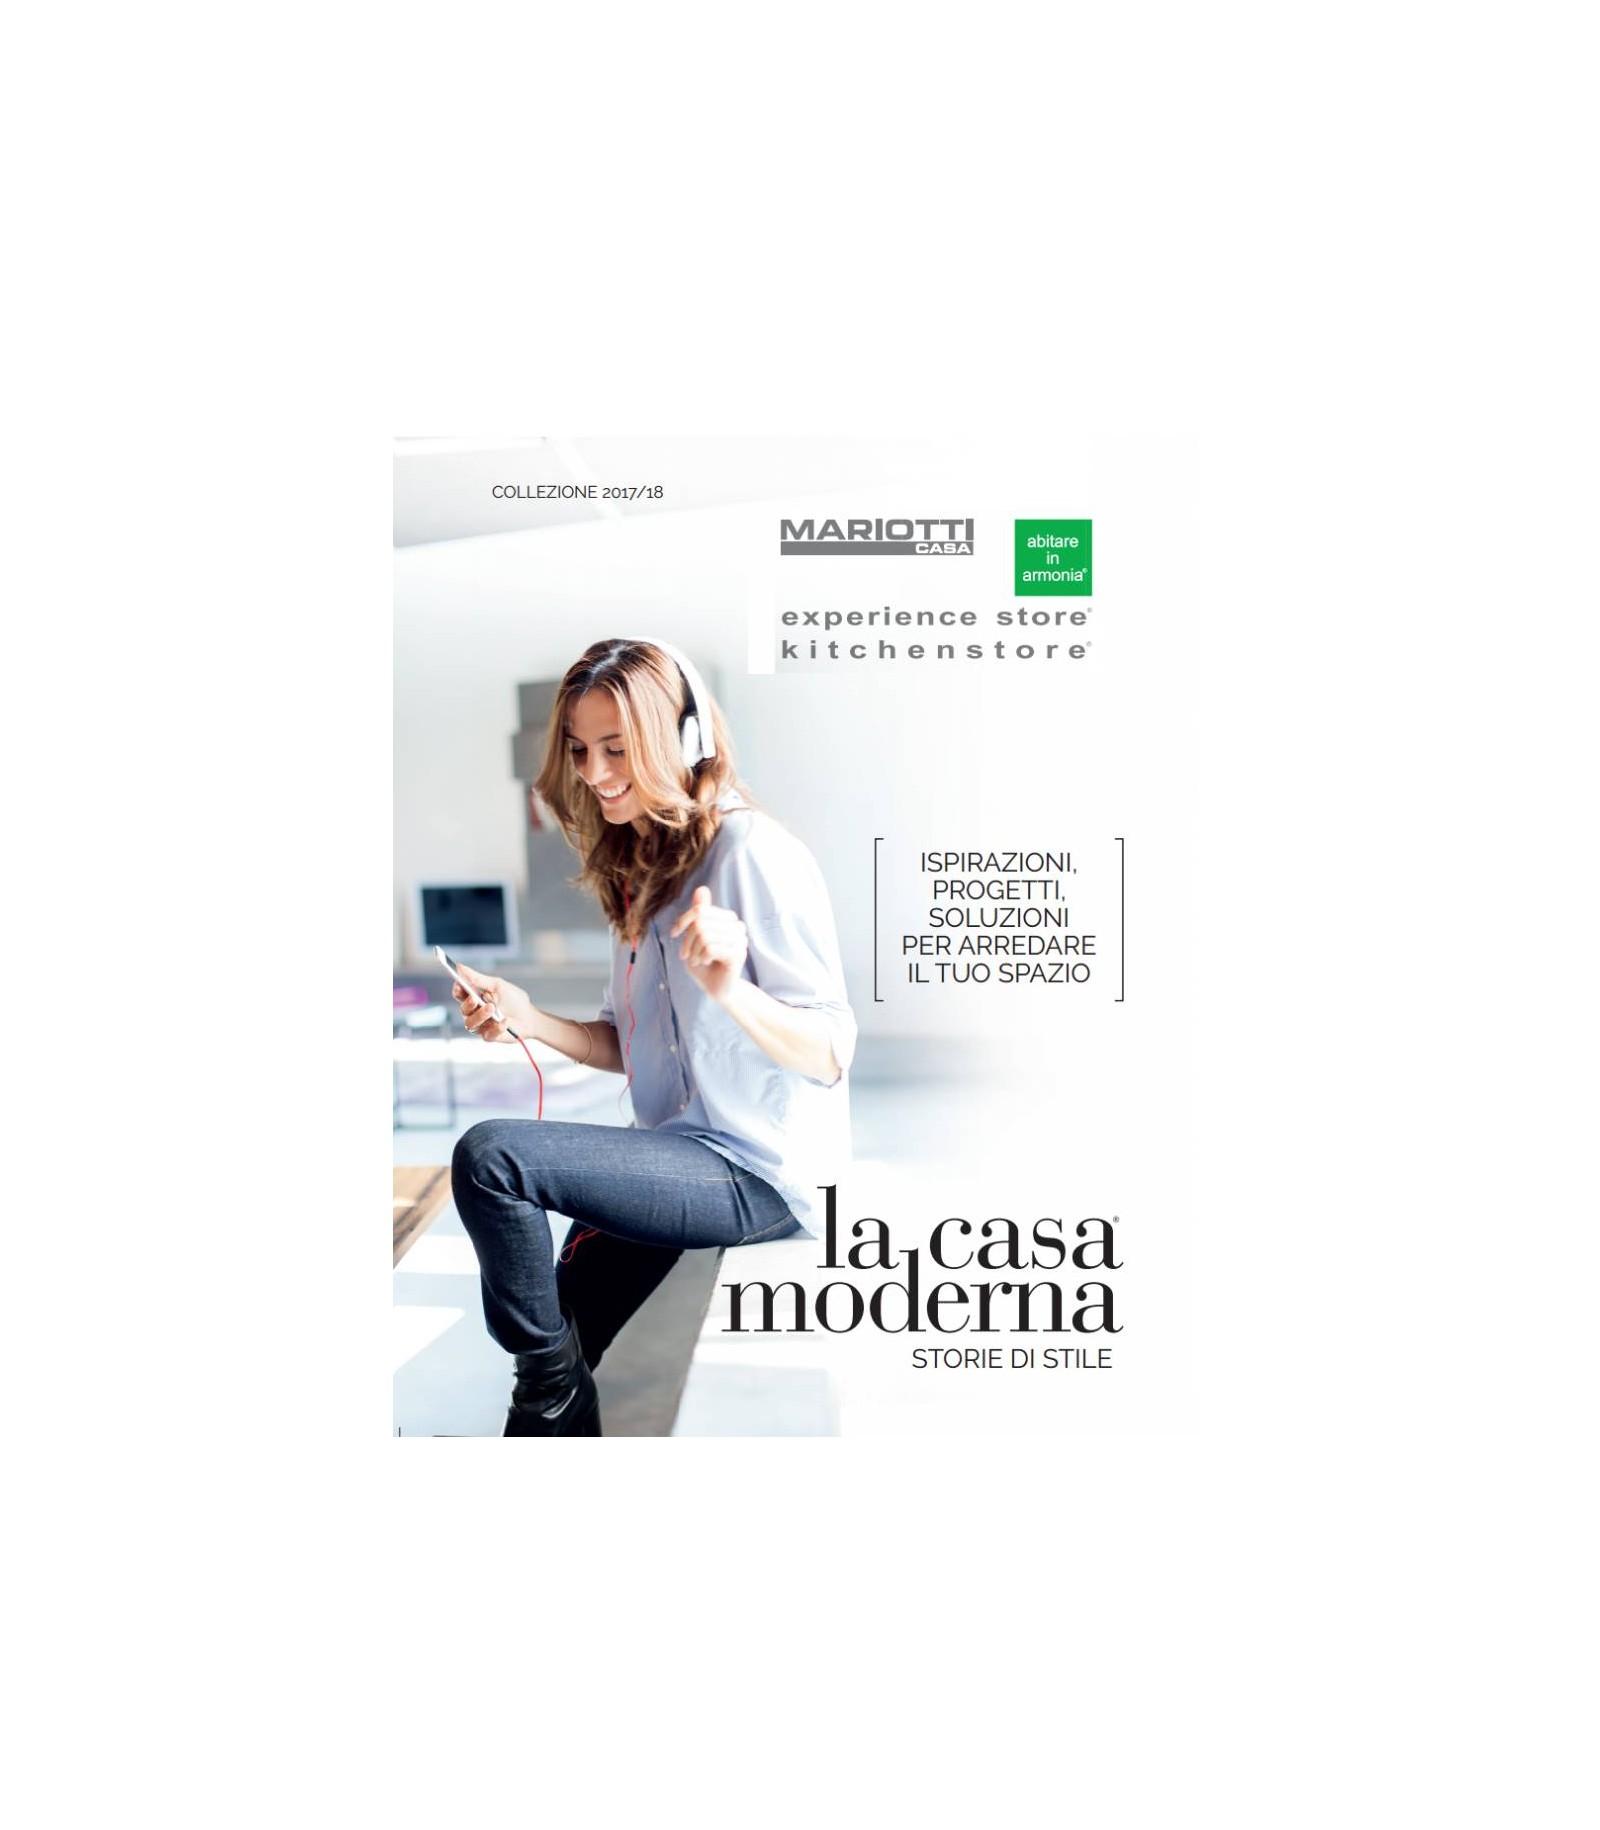 La casa moderna catalogo 2017 for Moderna catalogo